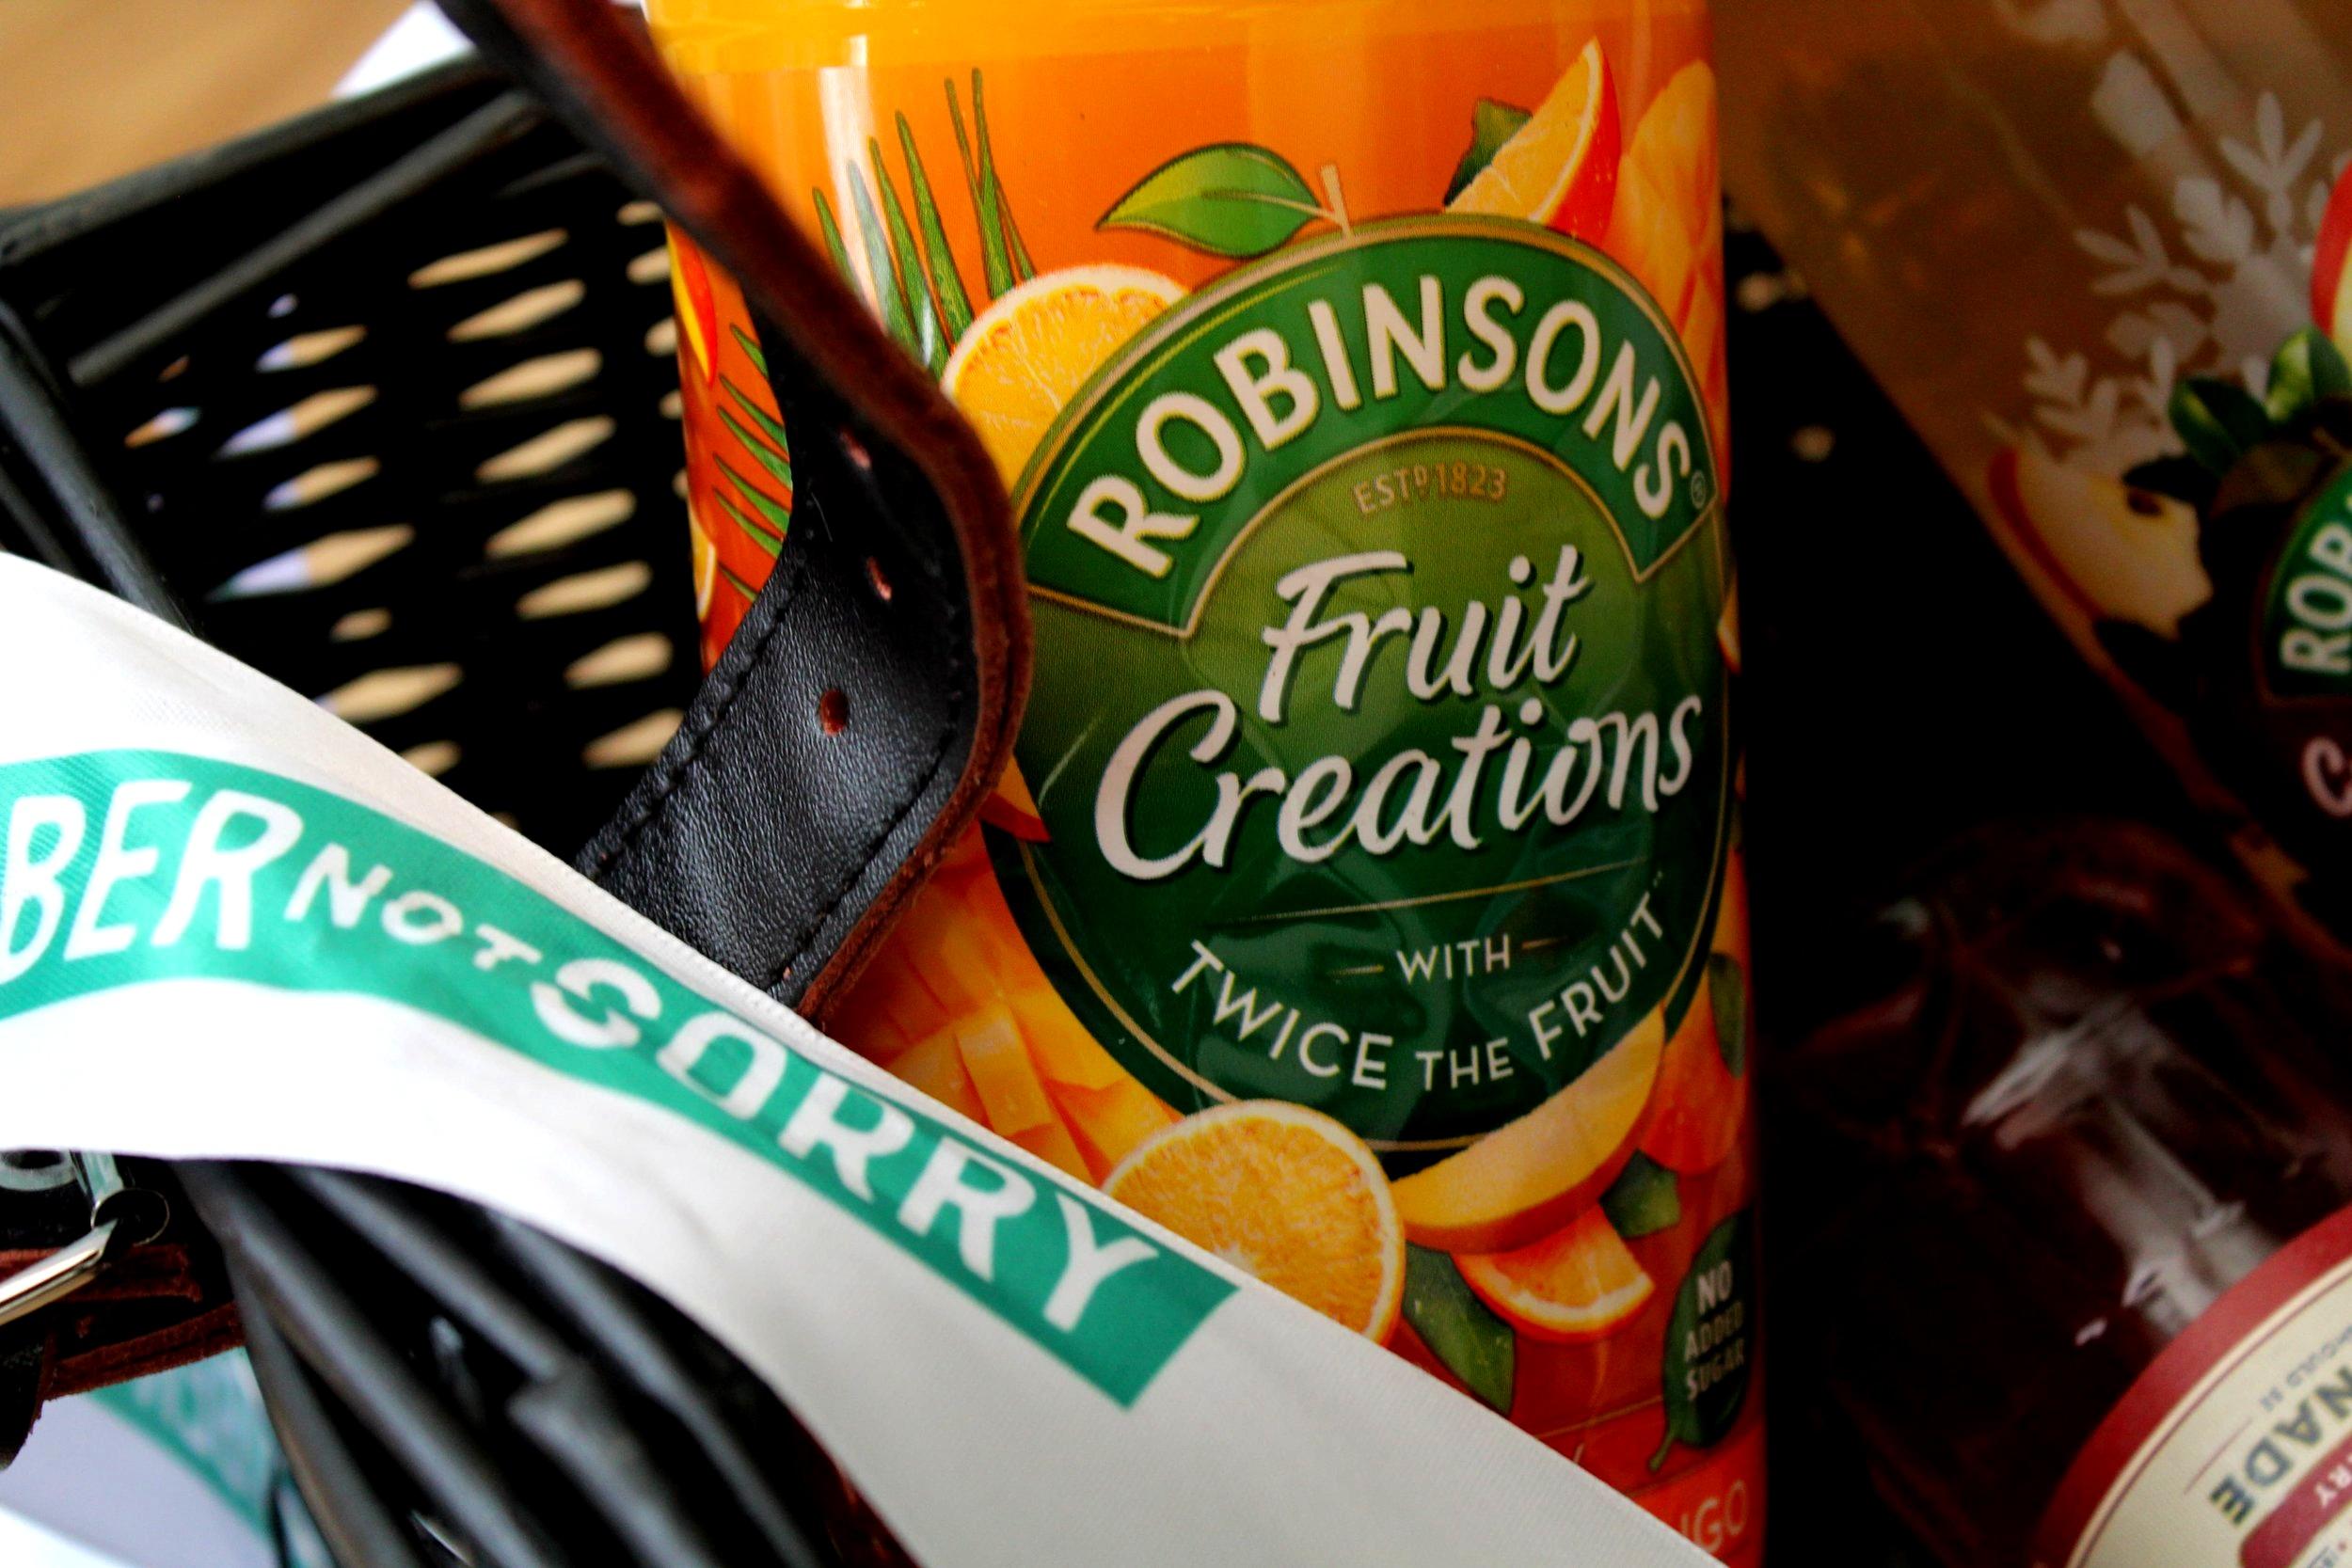 Robinsons Fruit Creations